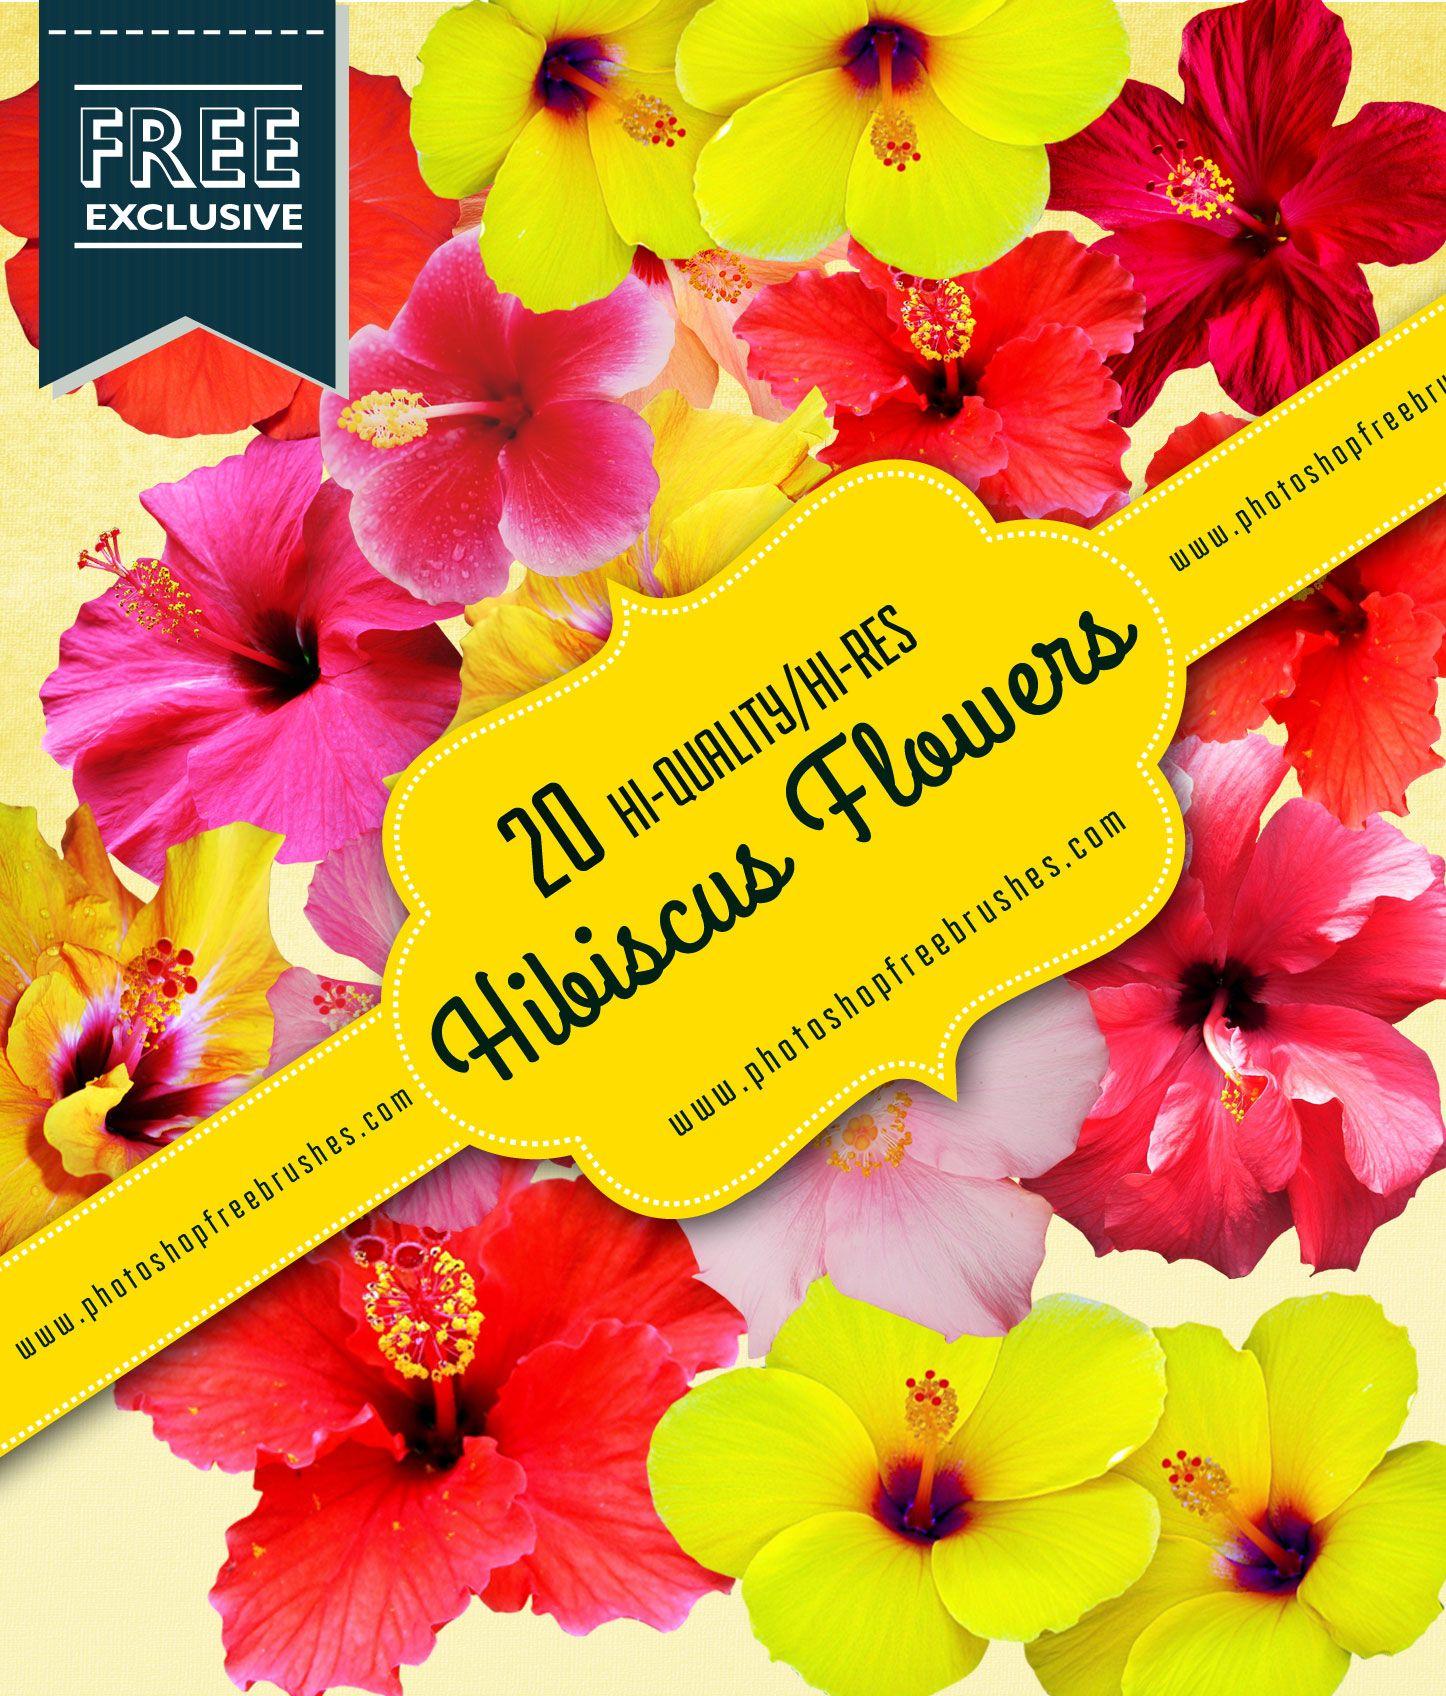 Hibiscus Flower Brushes Photoshop Brushes Free Flowers Hibiscus